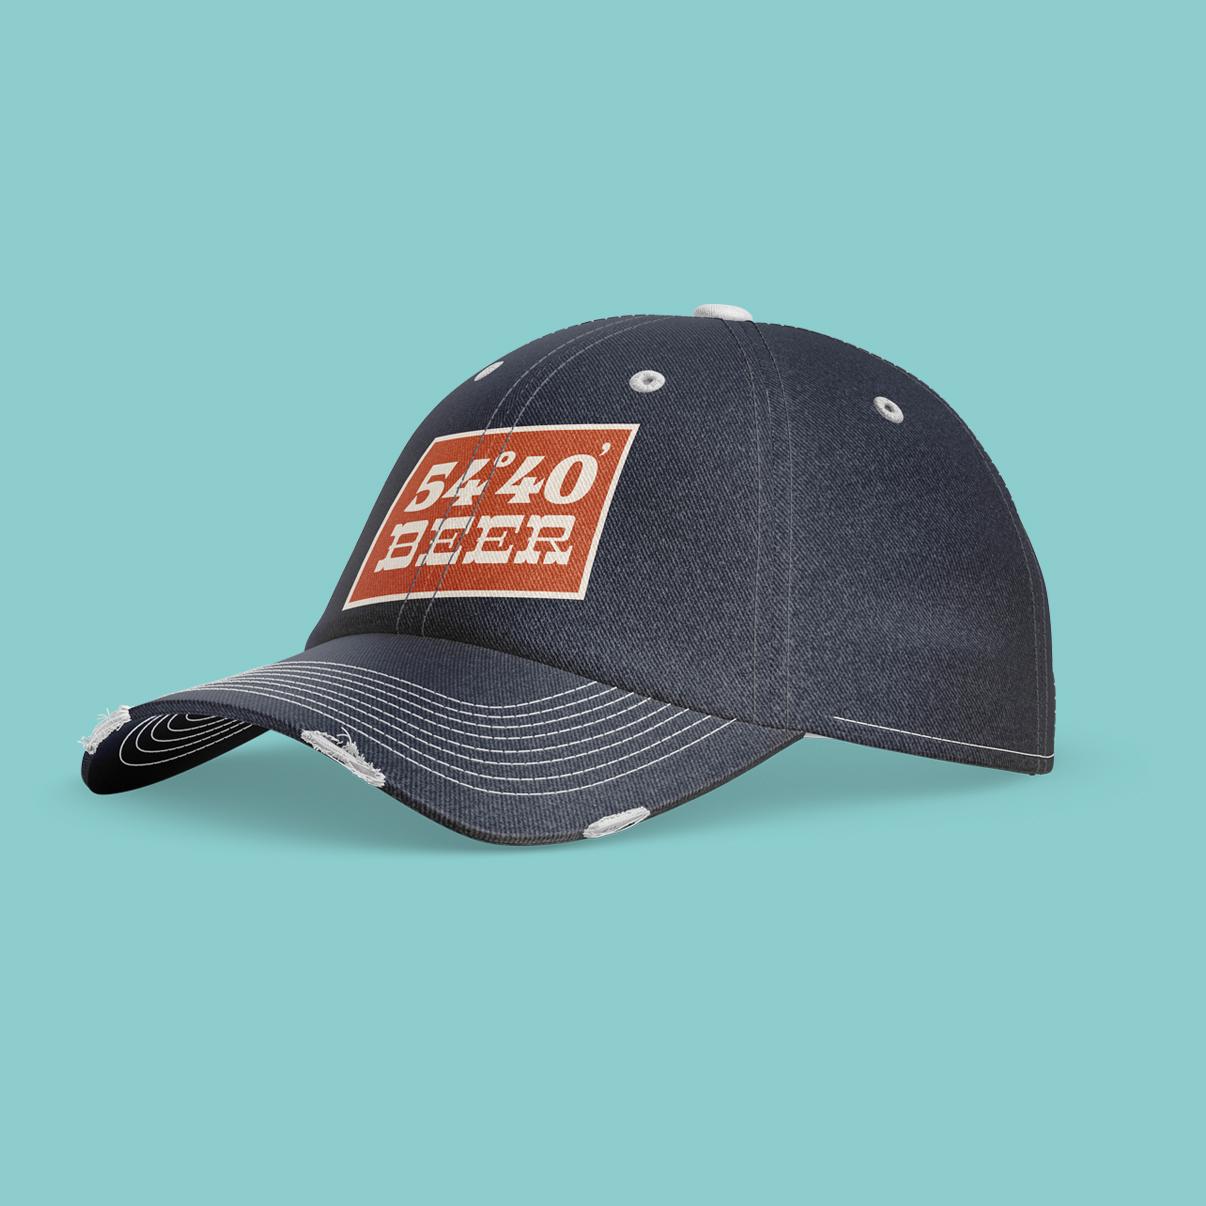 5440_hat.jpg